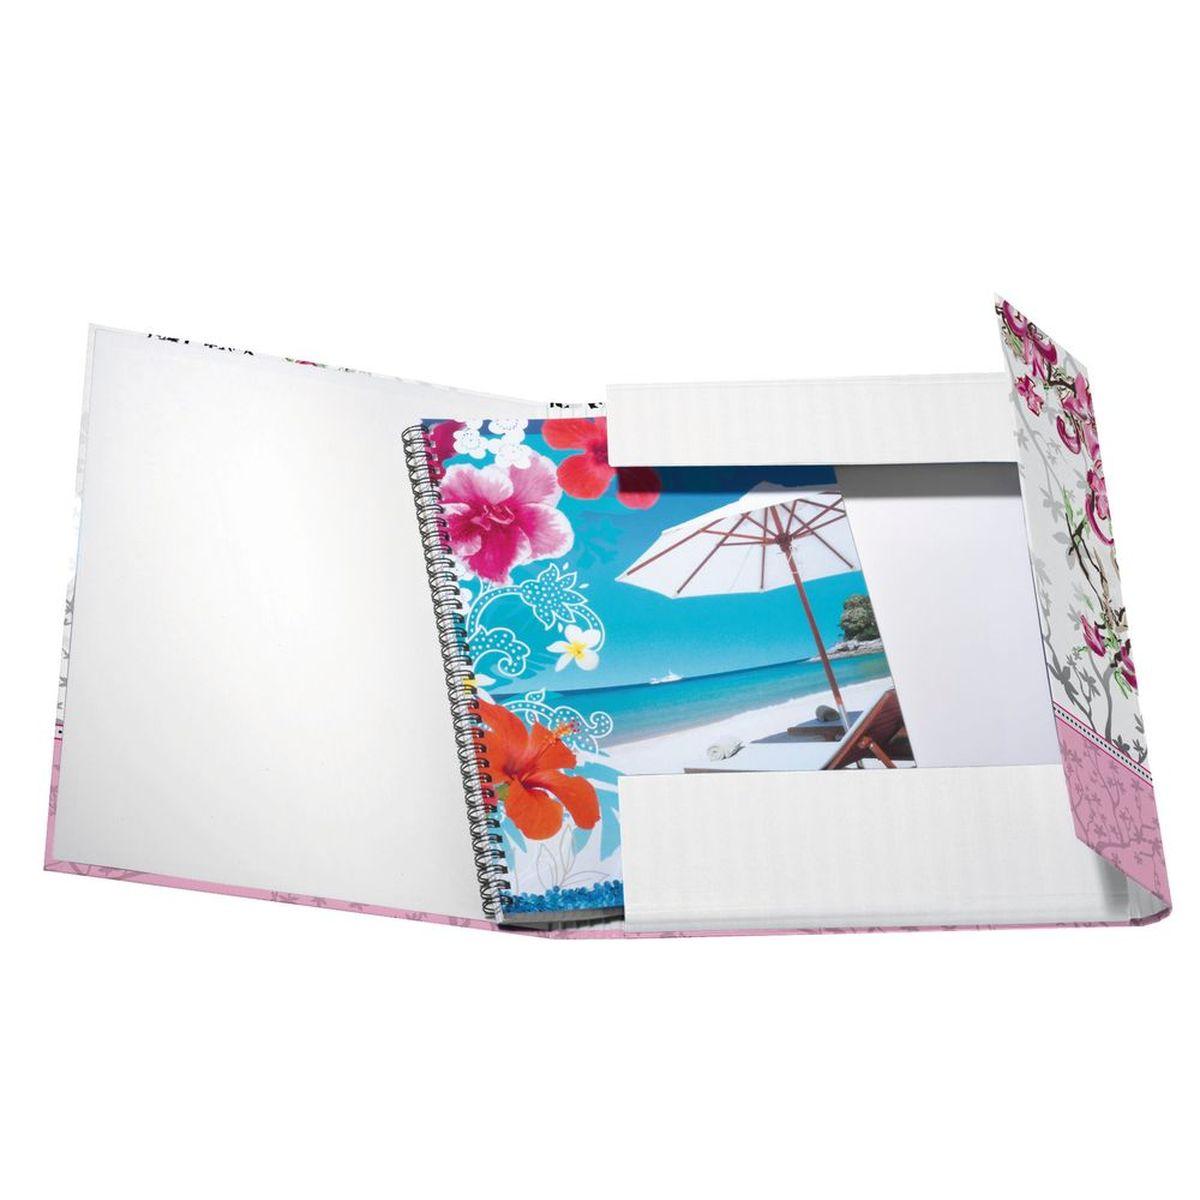 Herlitz Папка с резинкой Ladylike Bloom XL формат А4+